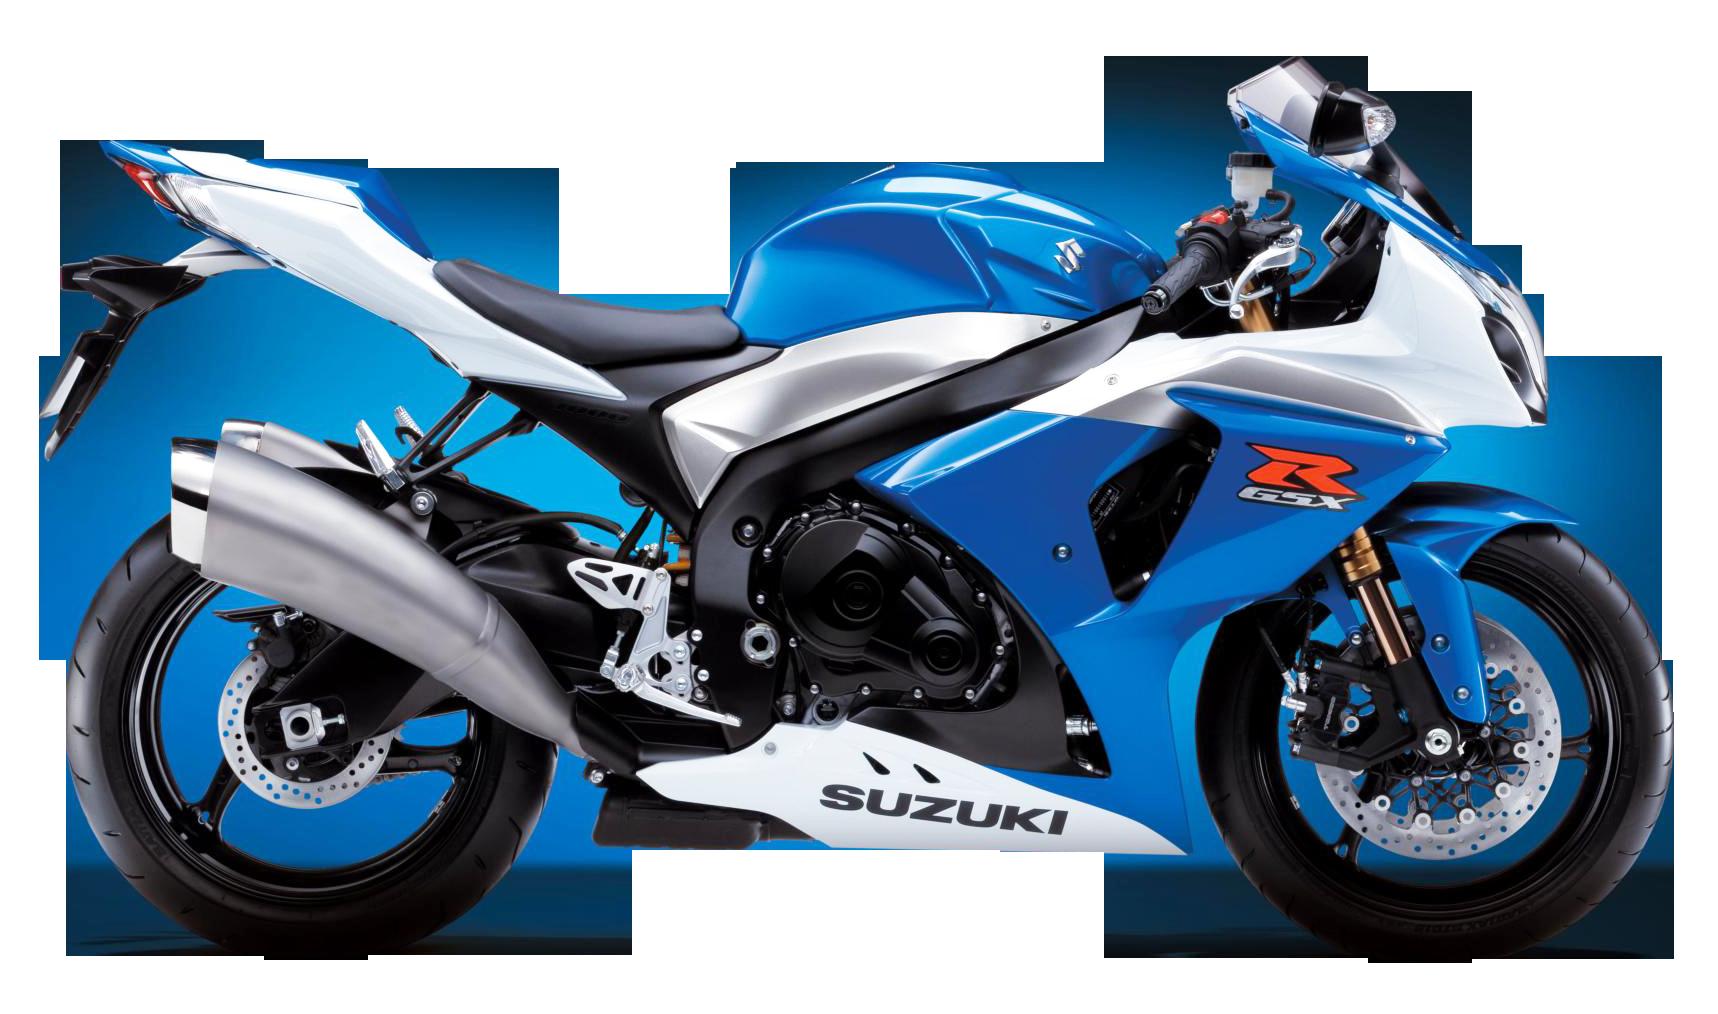 Suzuki png image purepng. Motorcycle clipart hayabusa